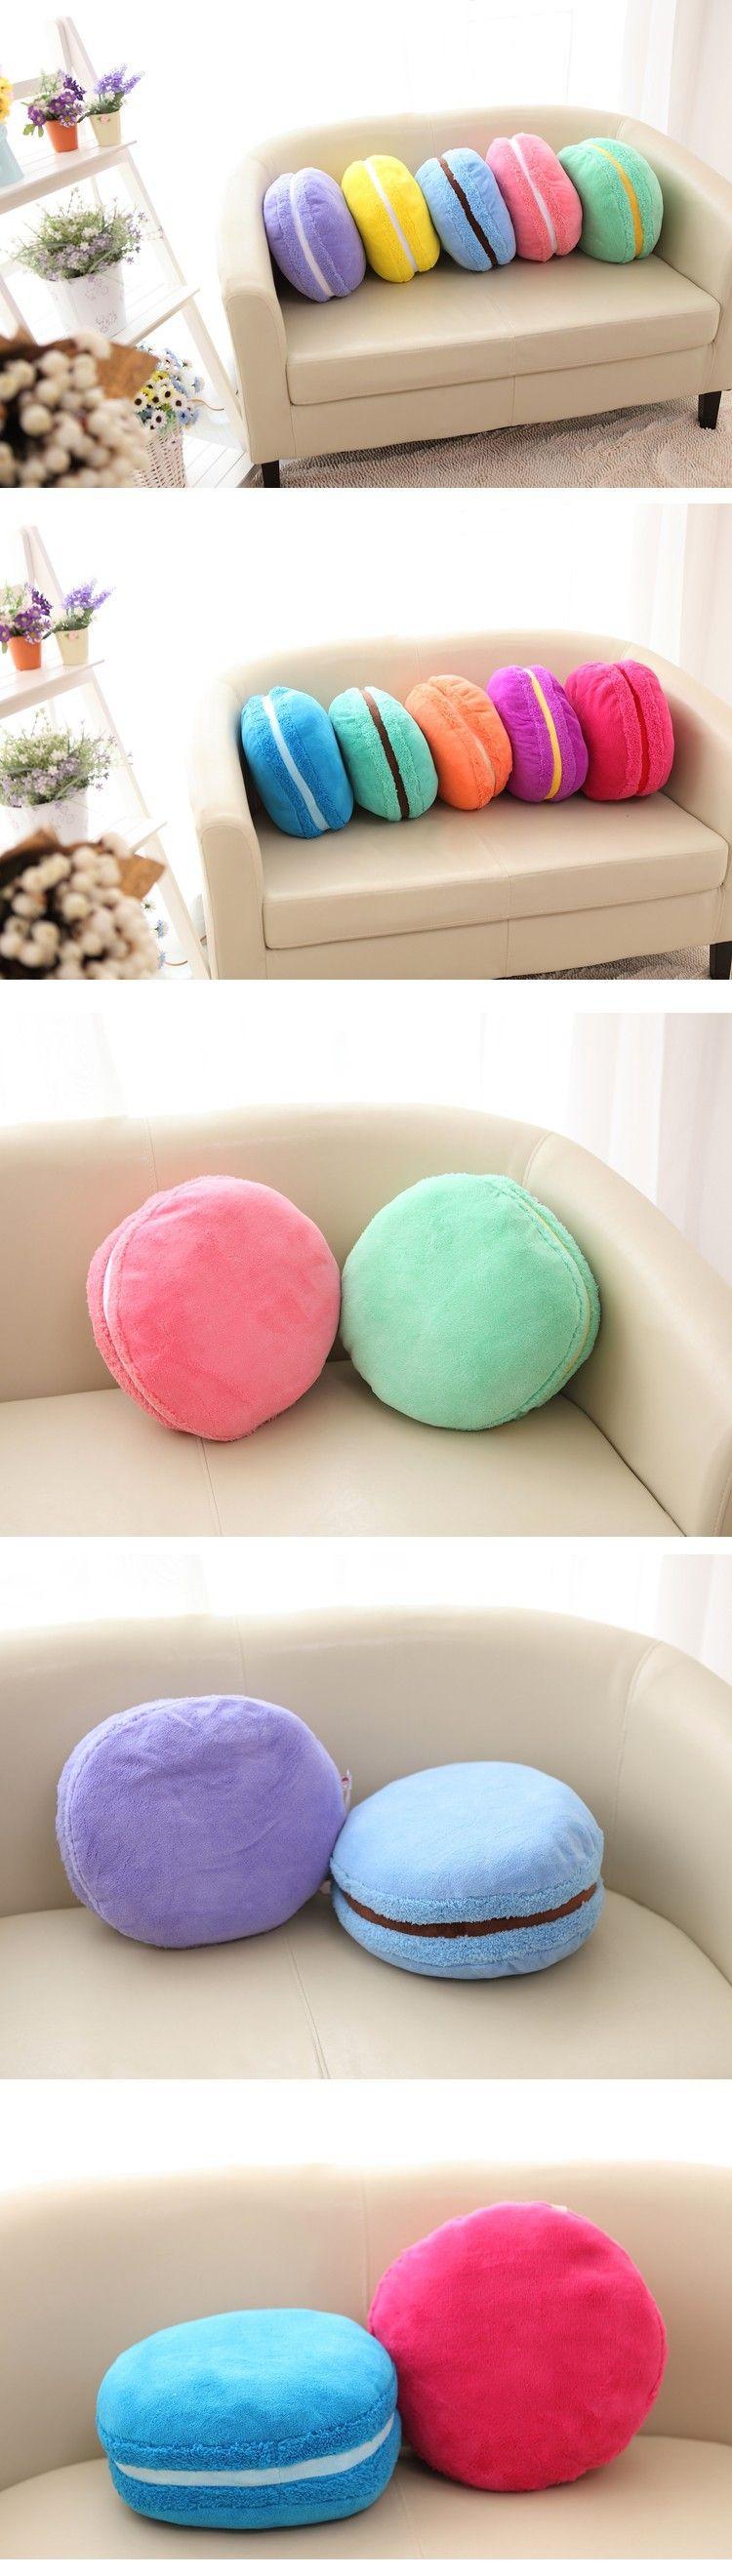 Macaron pillows more varrás pinterest pillows room and room decor